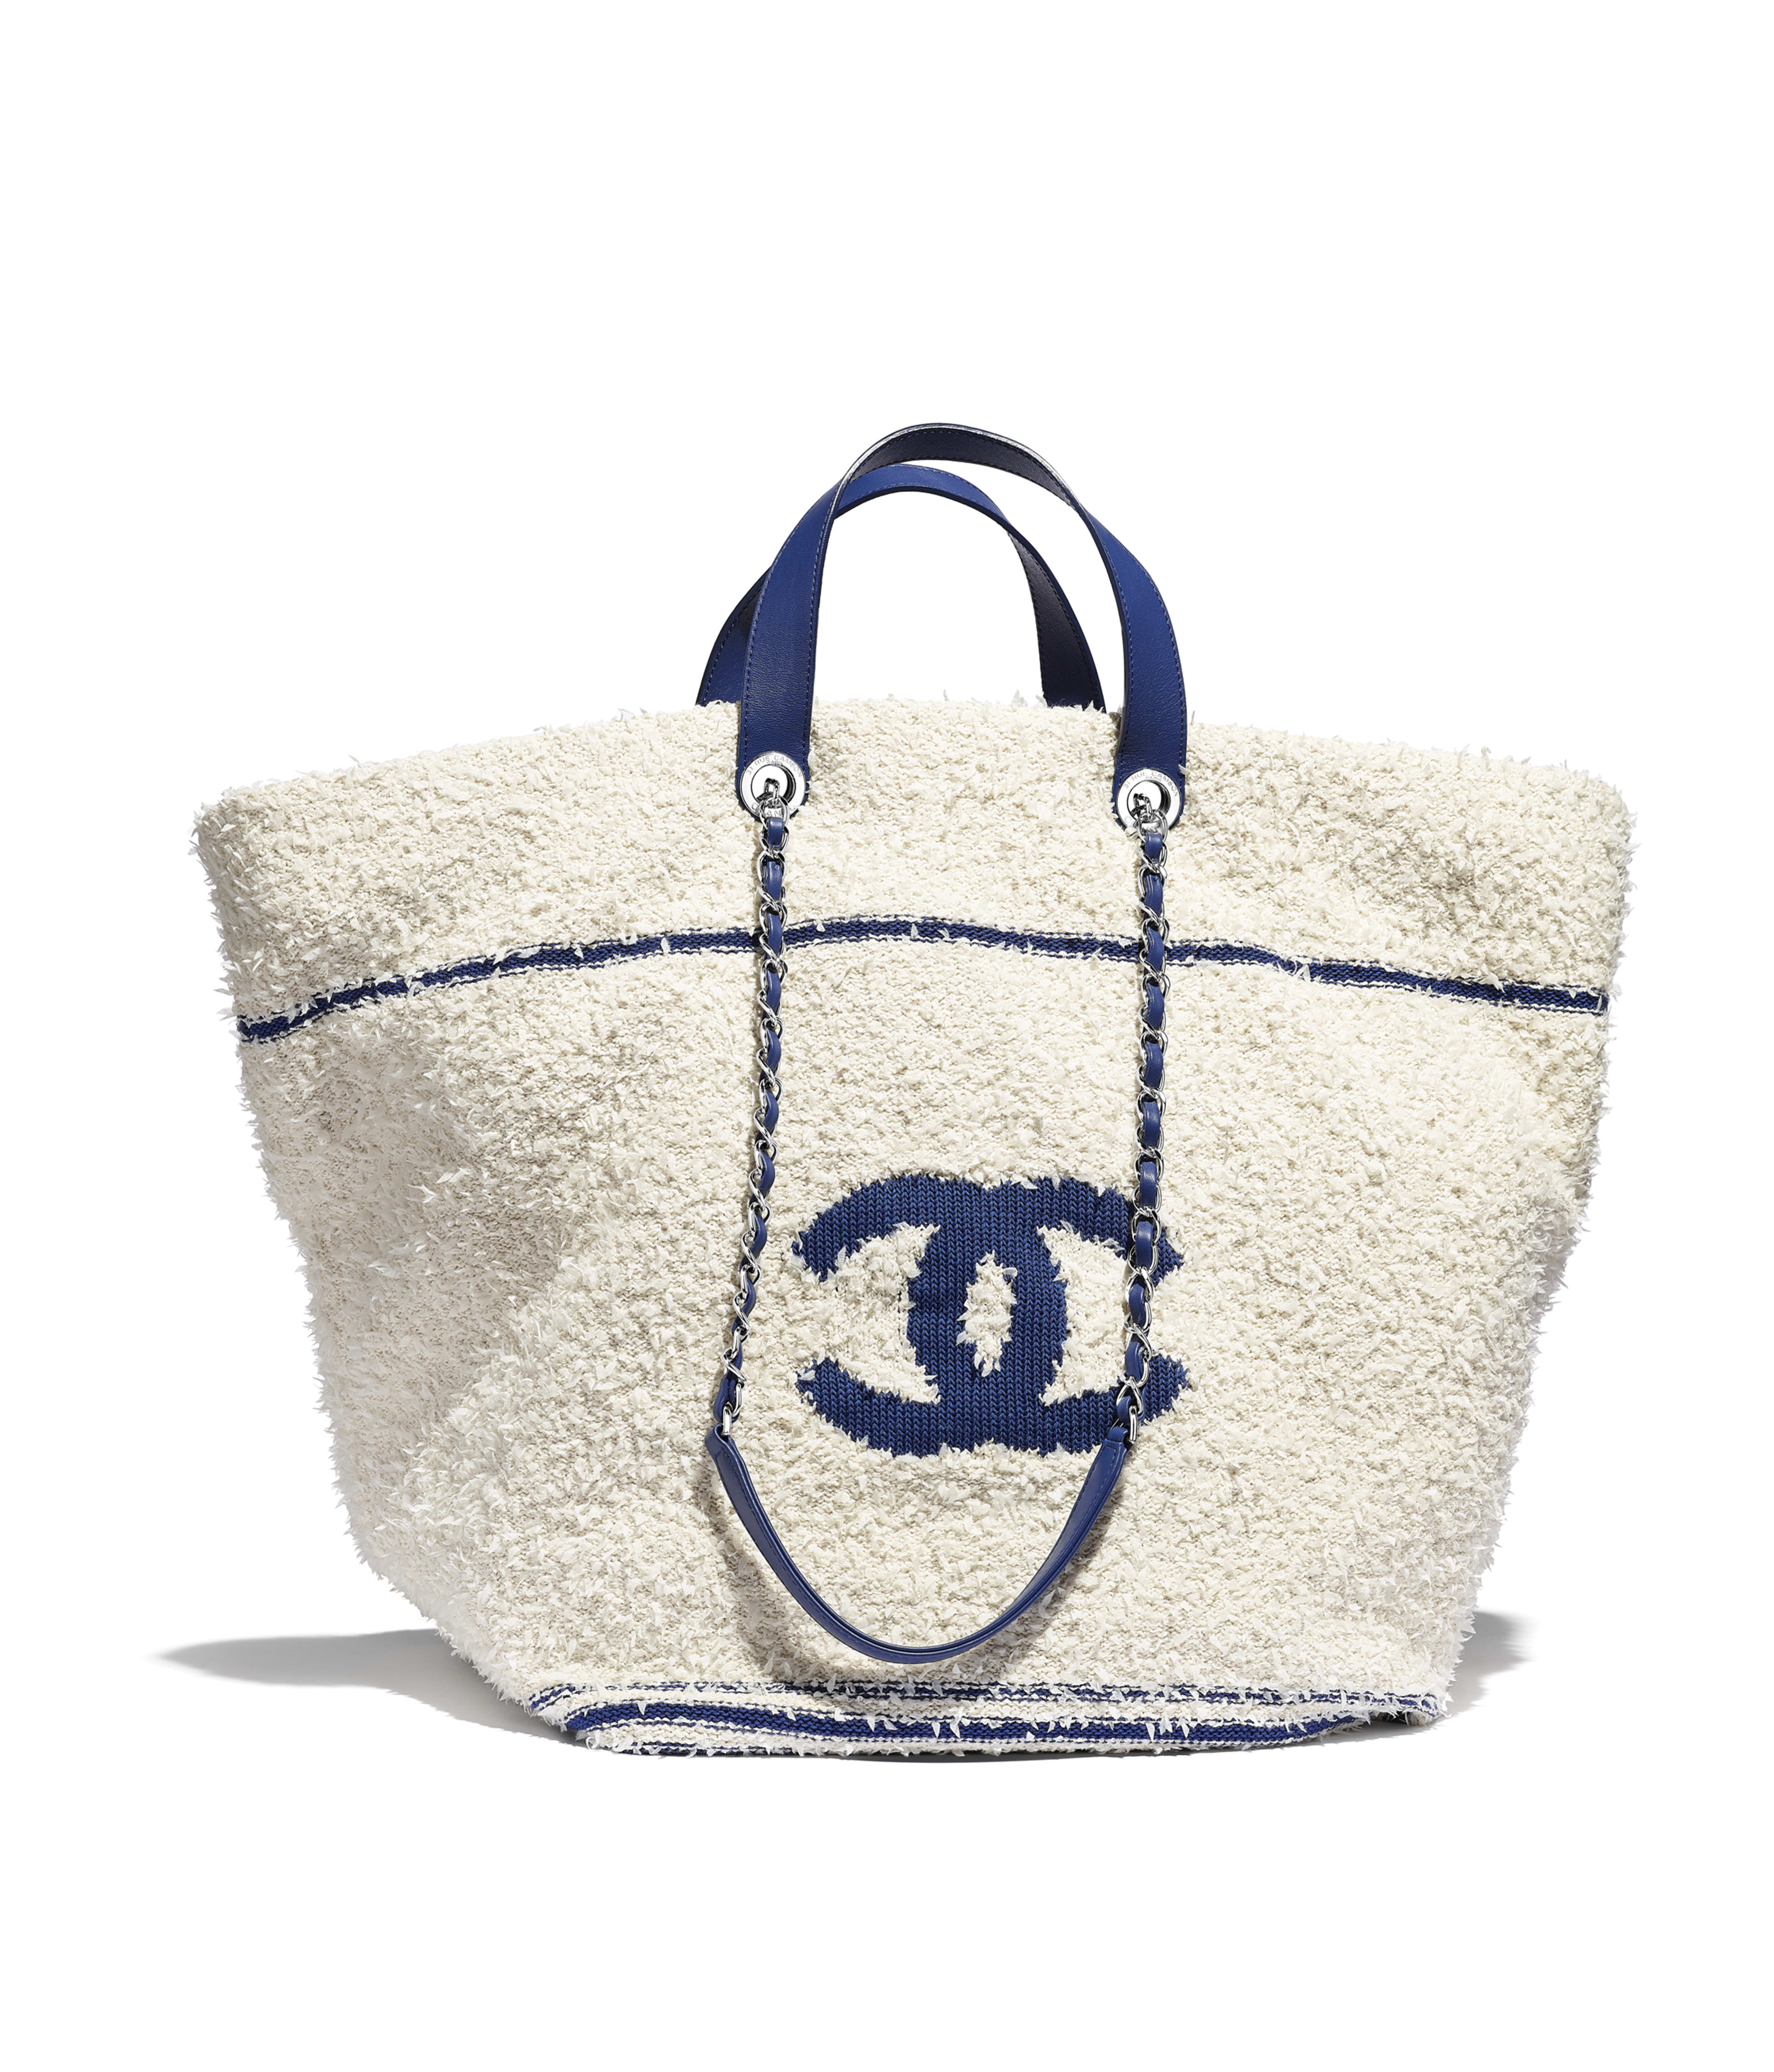 647fac05109f Large Shopping Bag Cotton, Lambskin & Silver-Tone Metal, White & Blue Ref.  AS0452B00251N0360